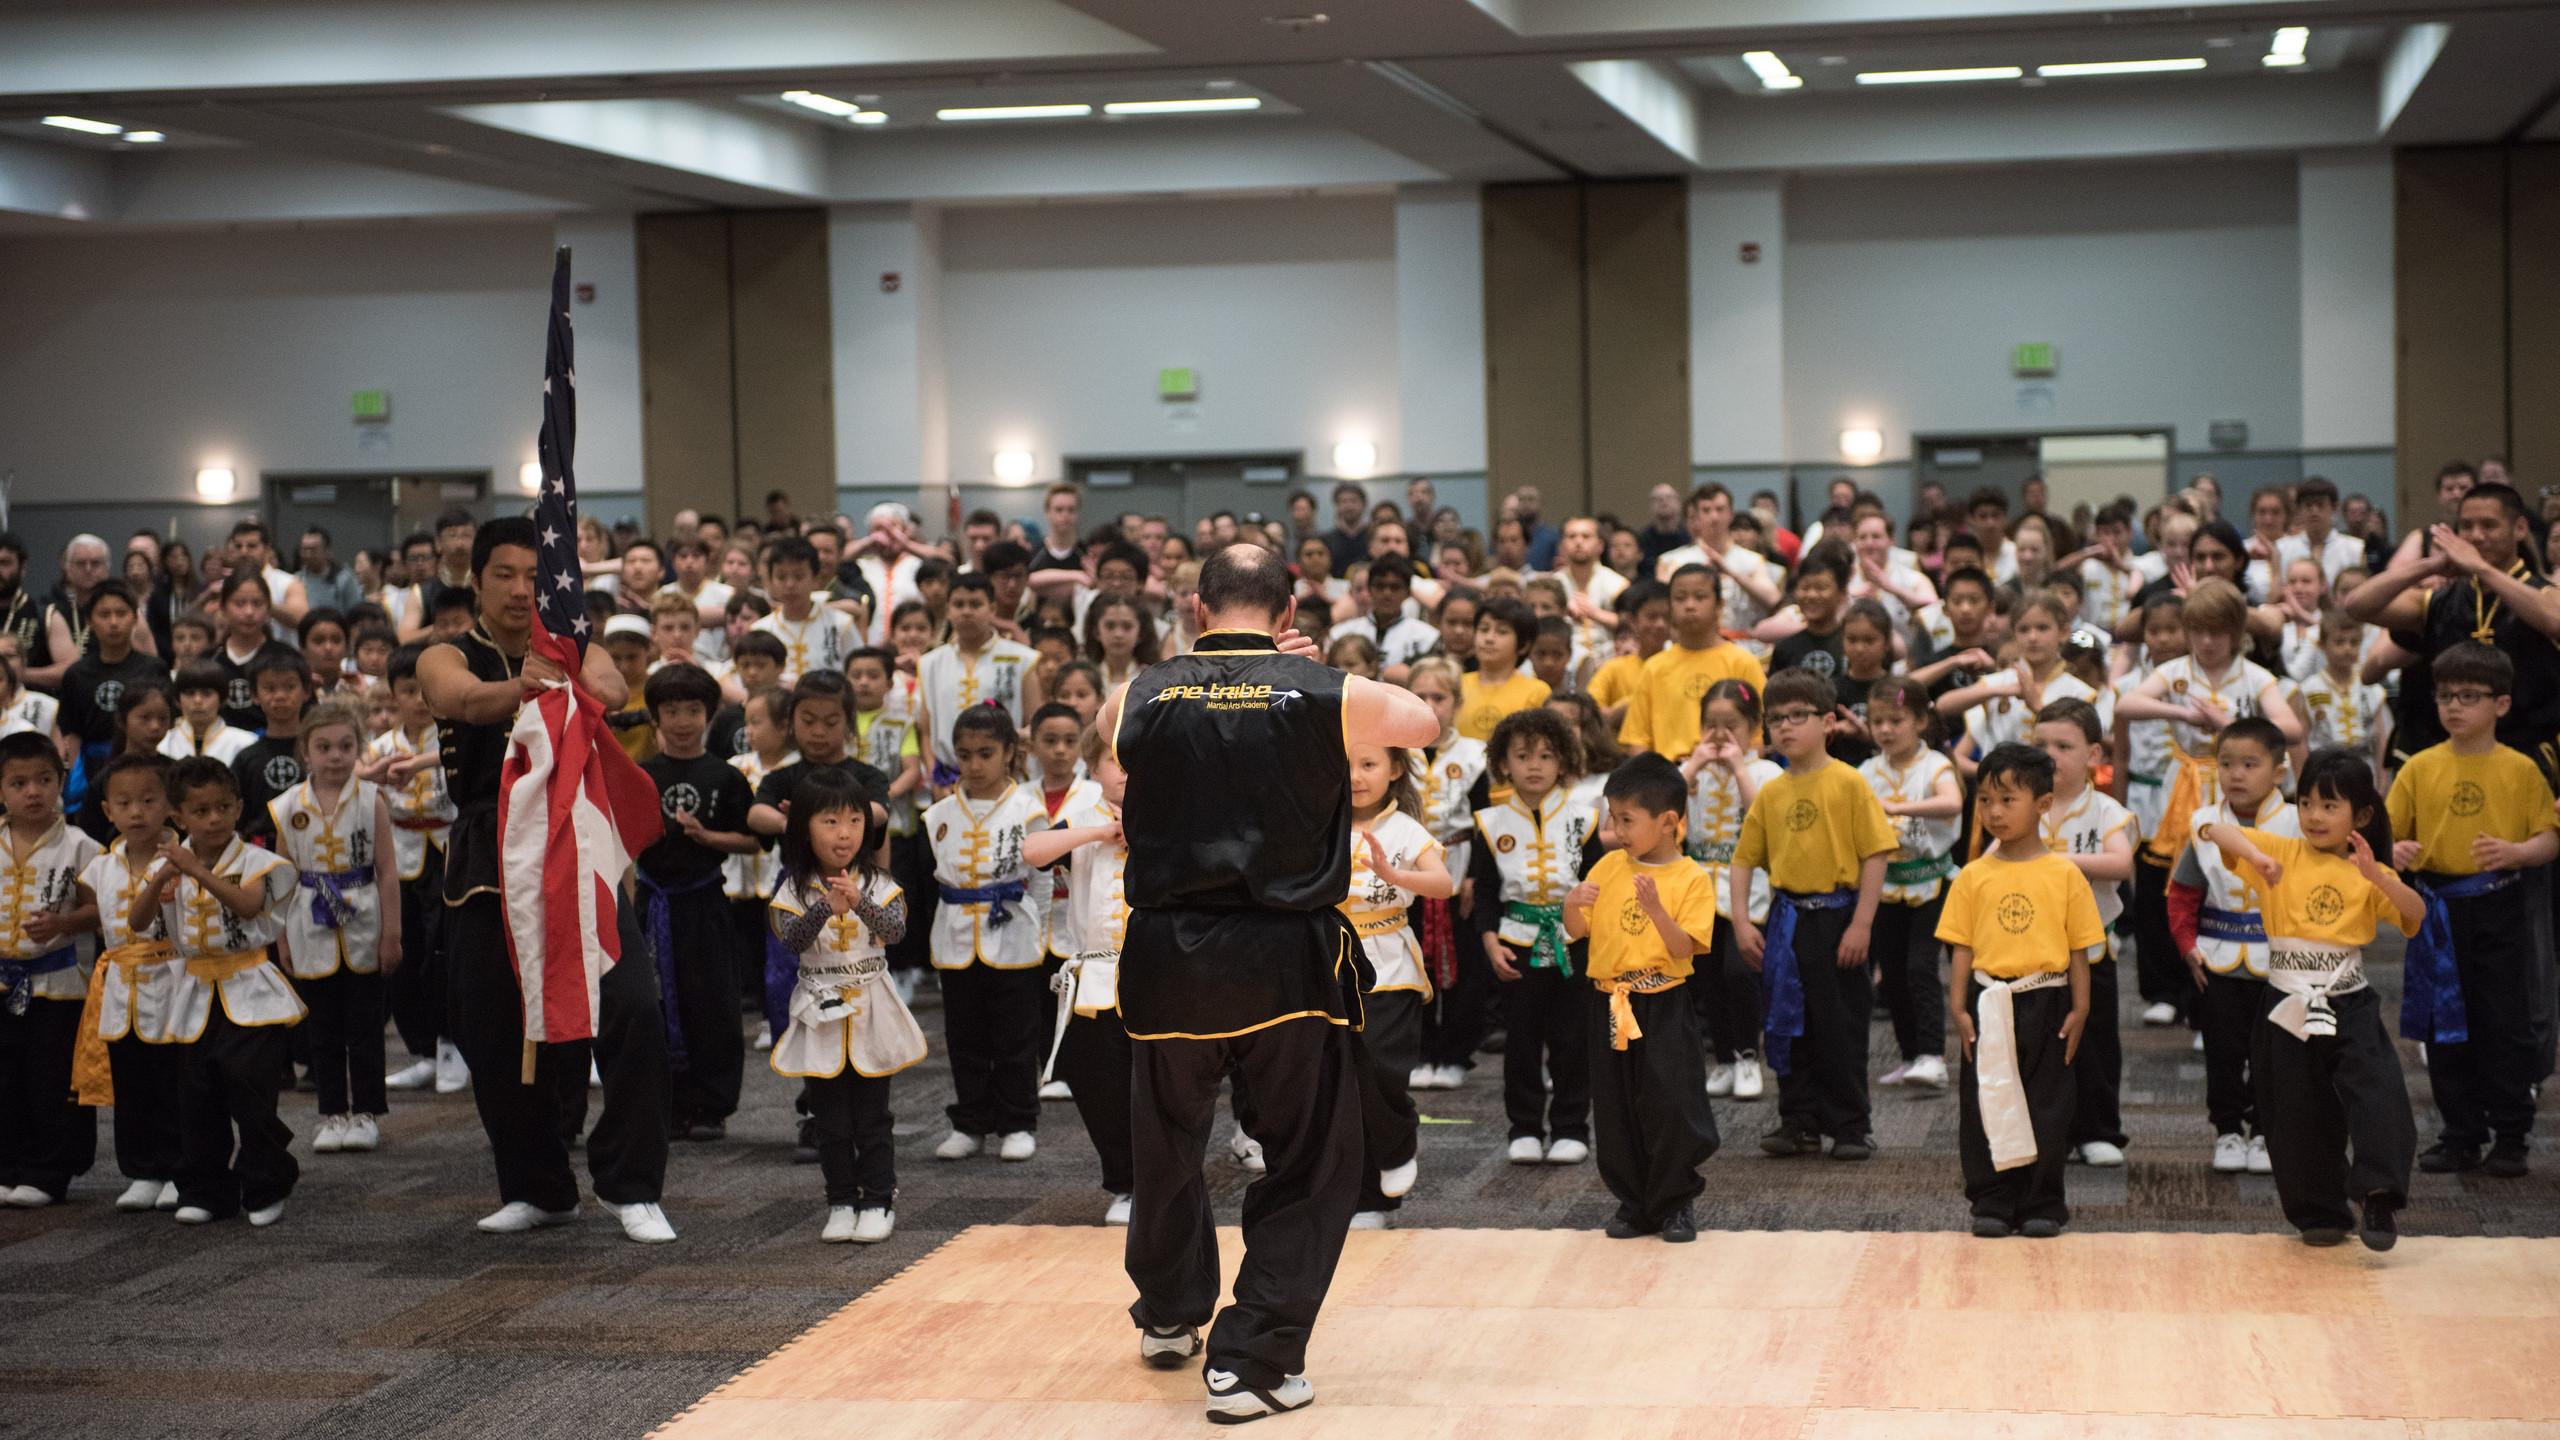 Sifu Barbosa leads the student creed.